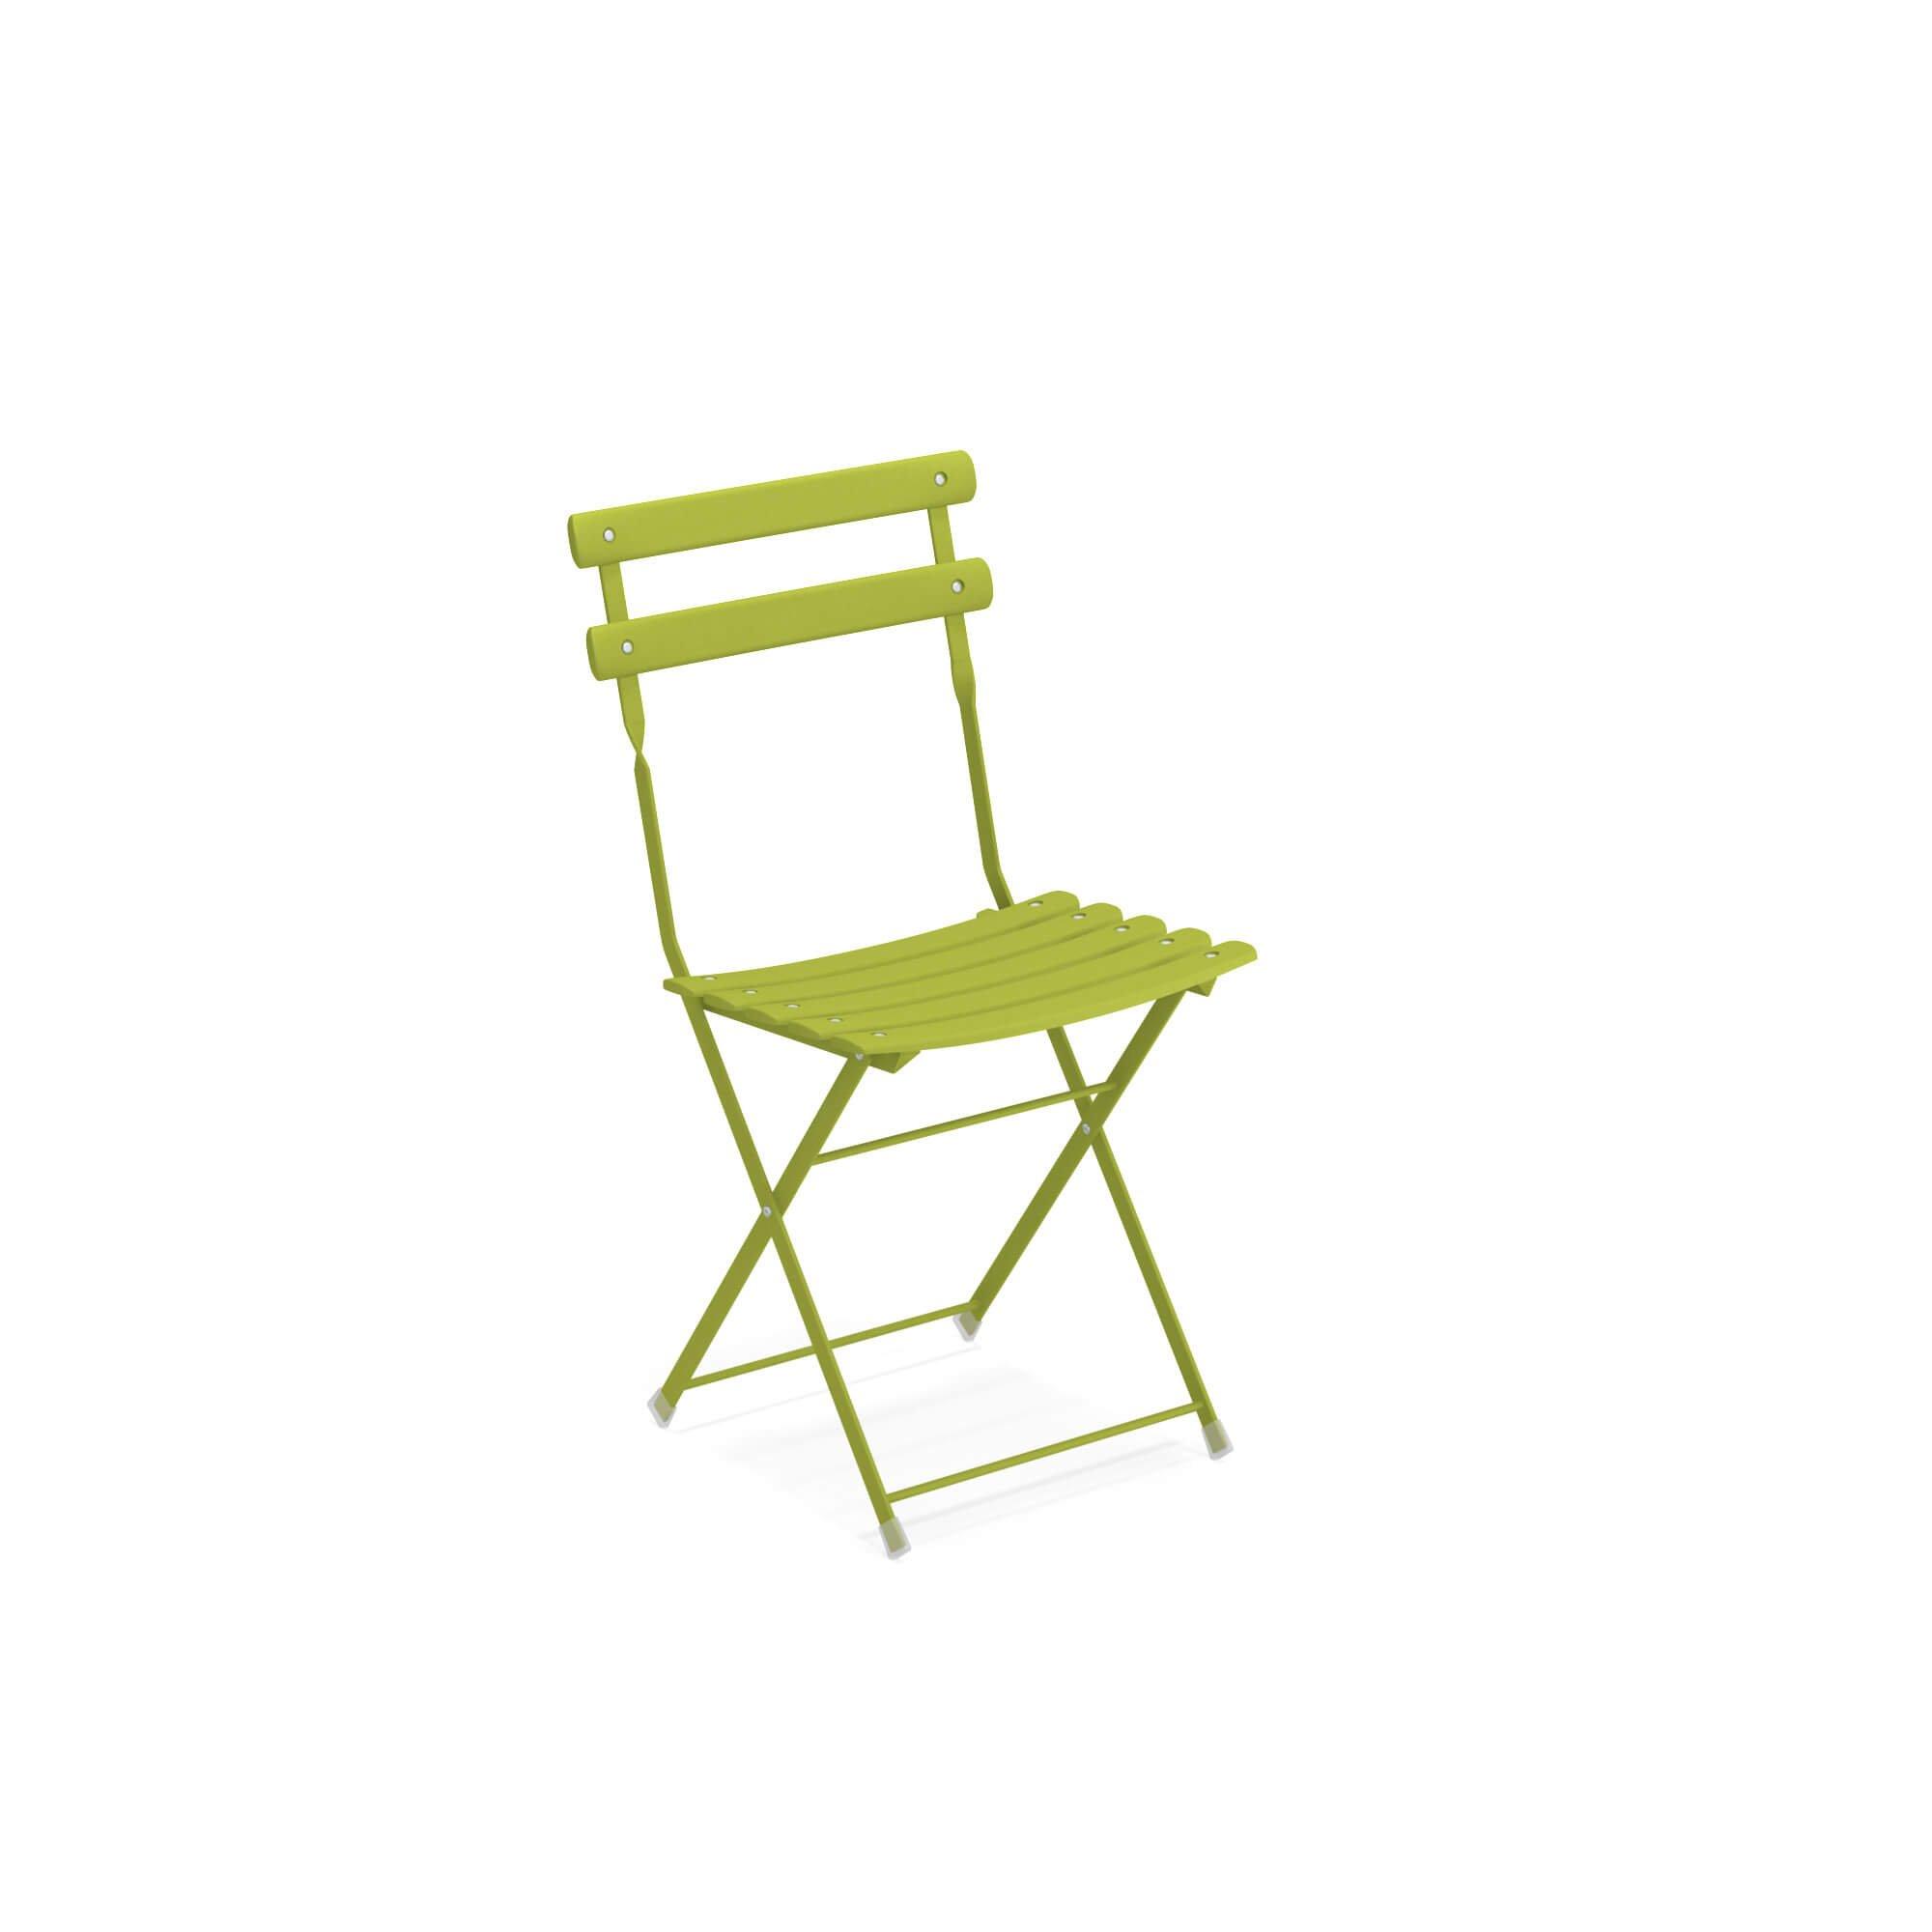 Arc en Ciel Folding Chair  from Emu, designed by EMU Design Studio